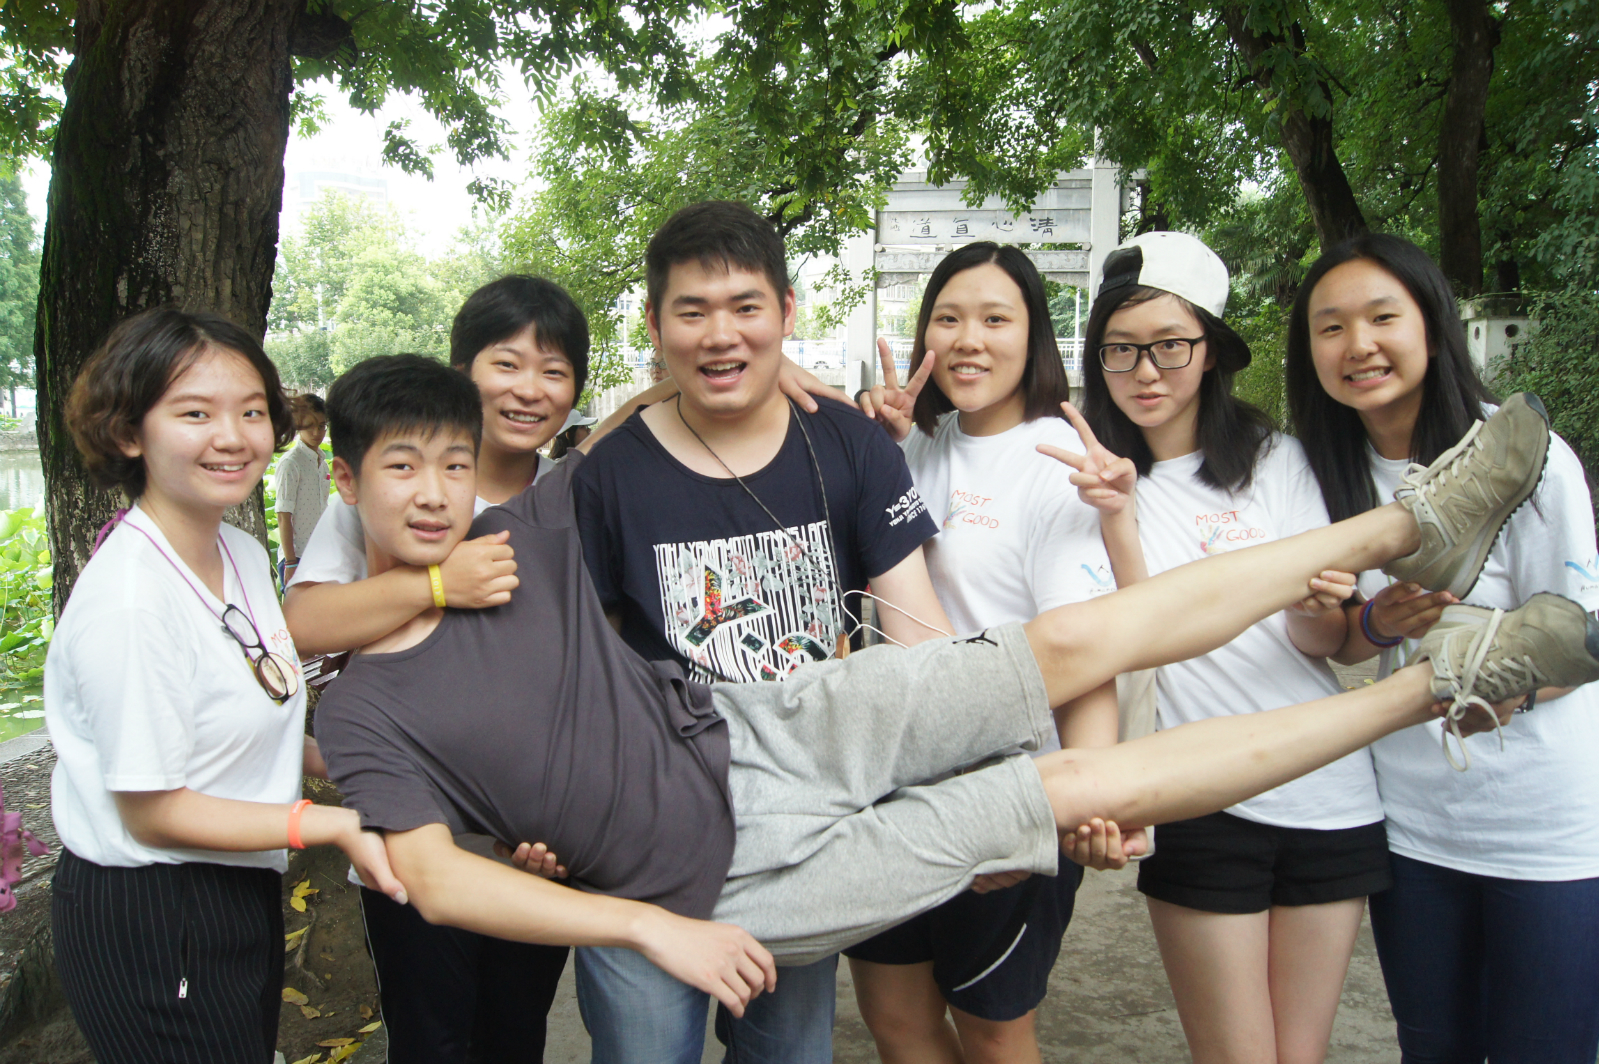 The lovely volunteer group